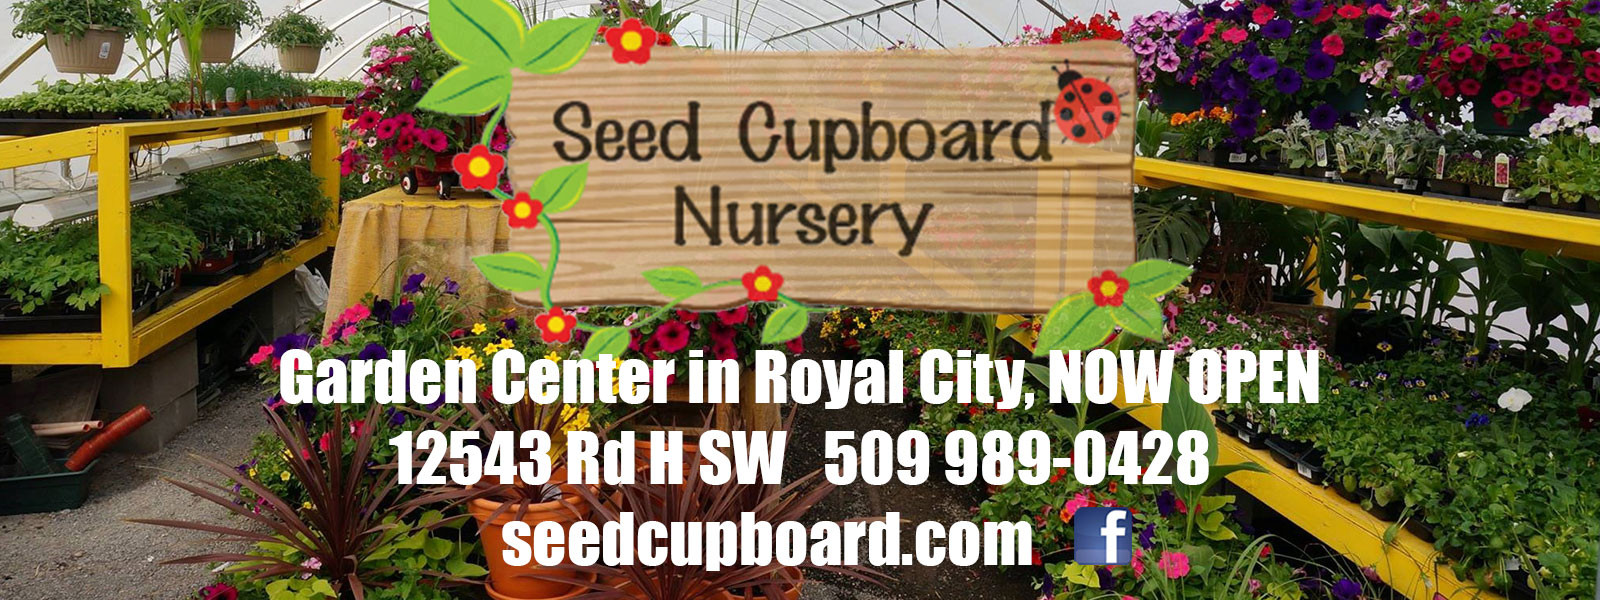 Seed Cupboard